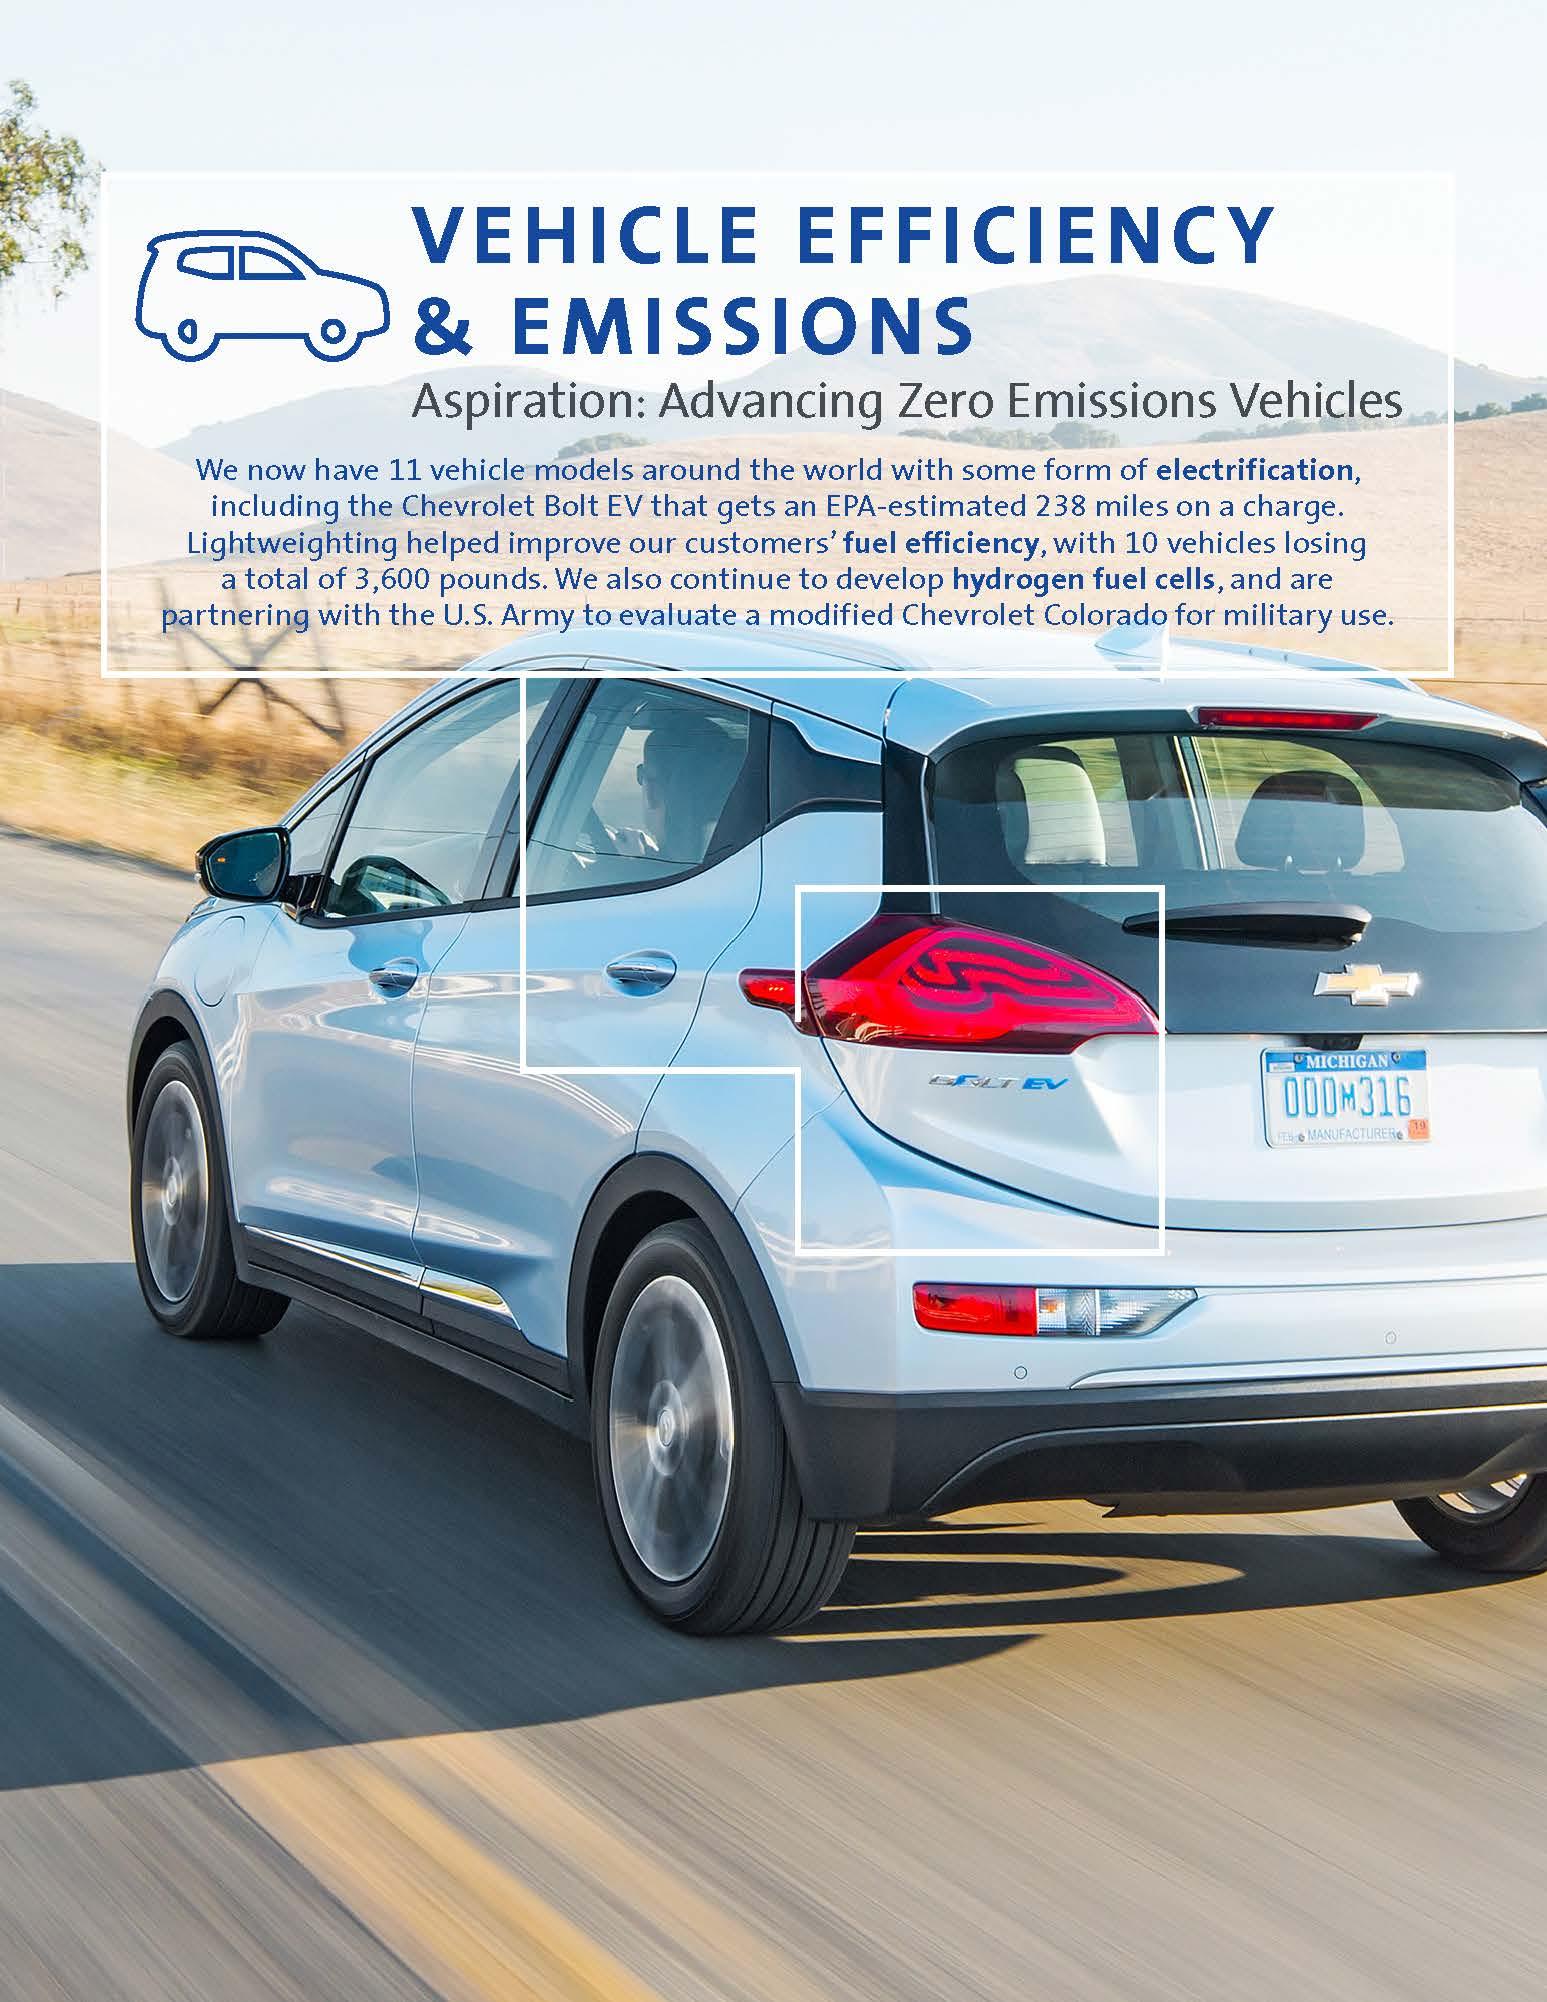 General Motors 2016 Sustainability Report Progress In